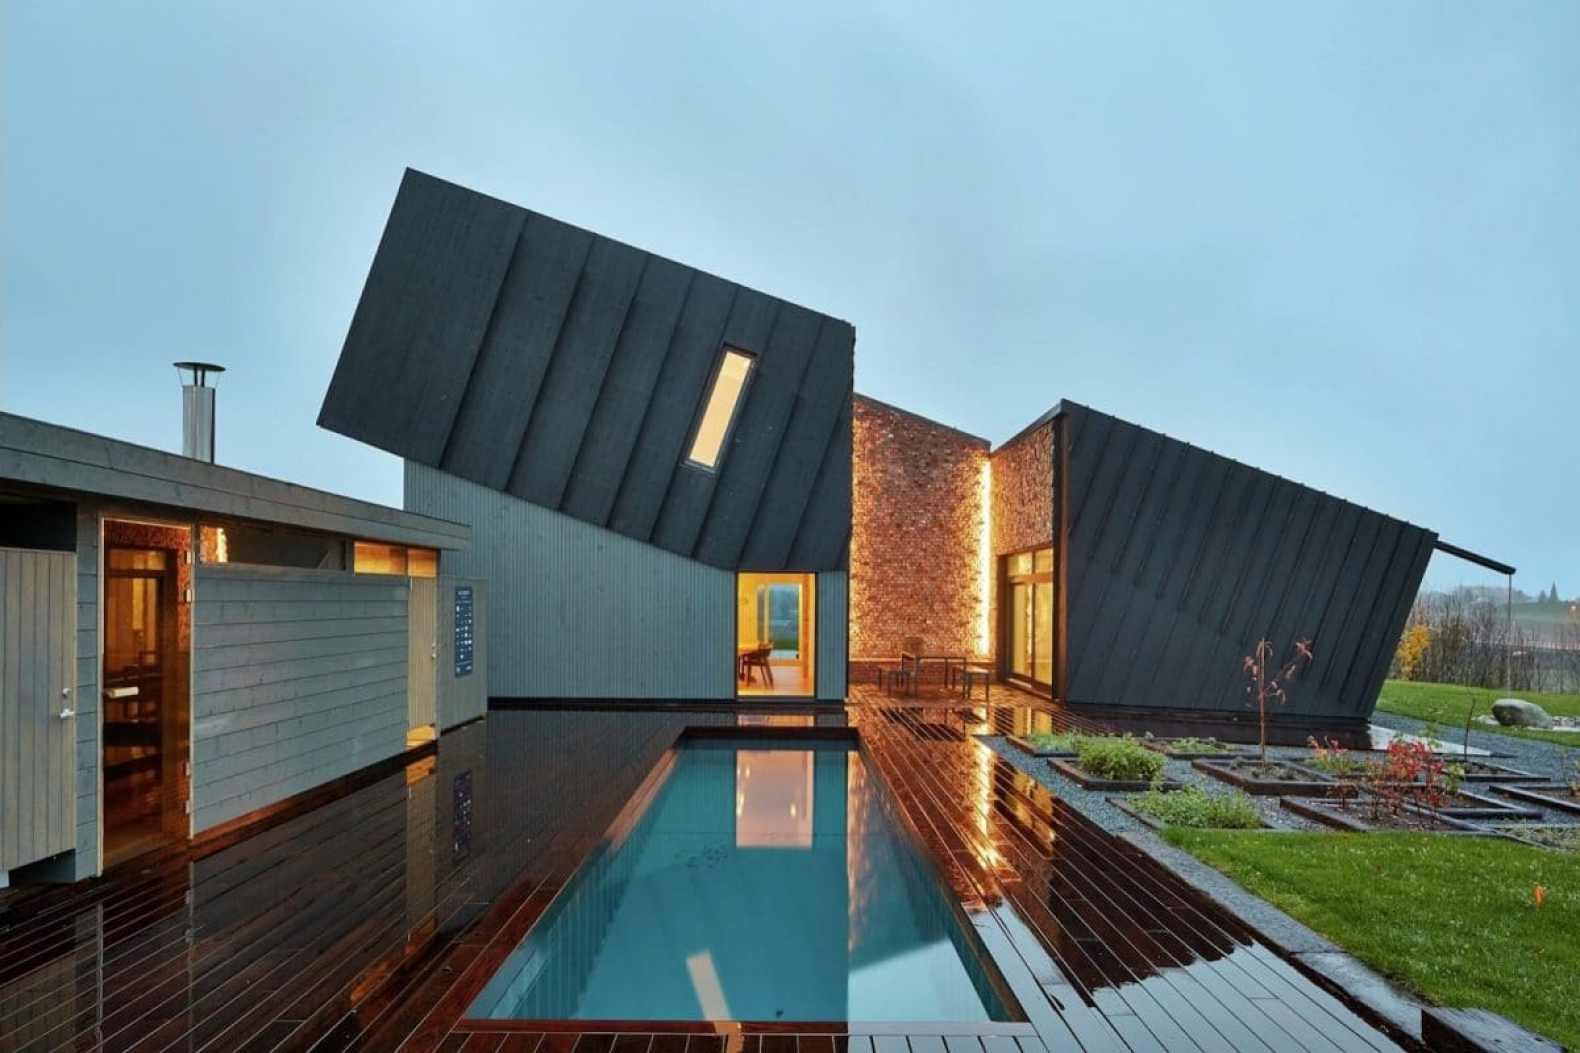 ZEB Pilot House by Snøhetta in Norway